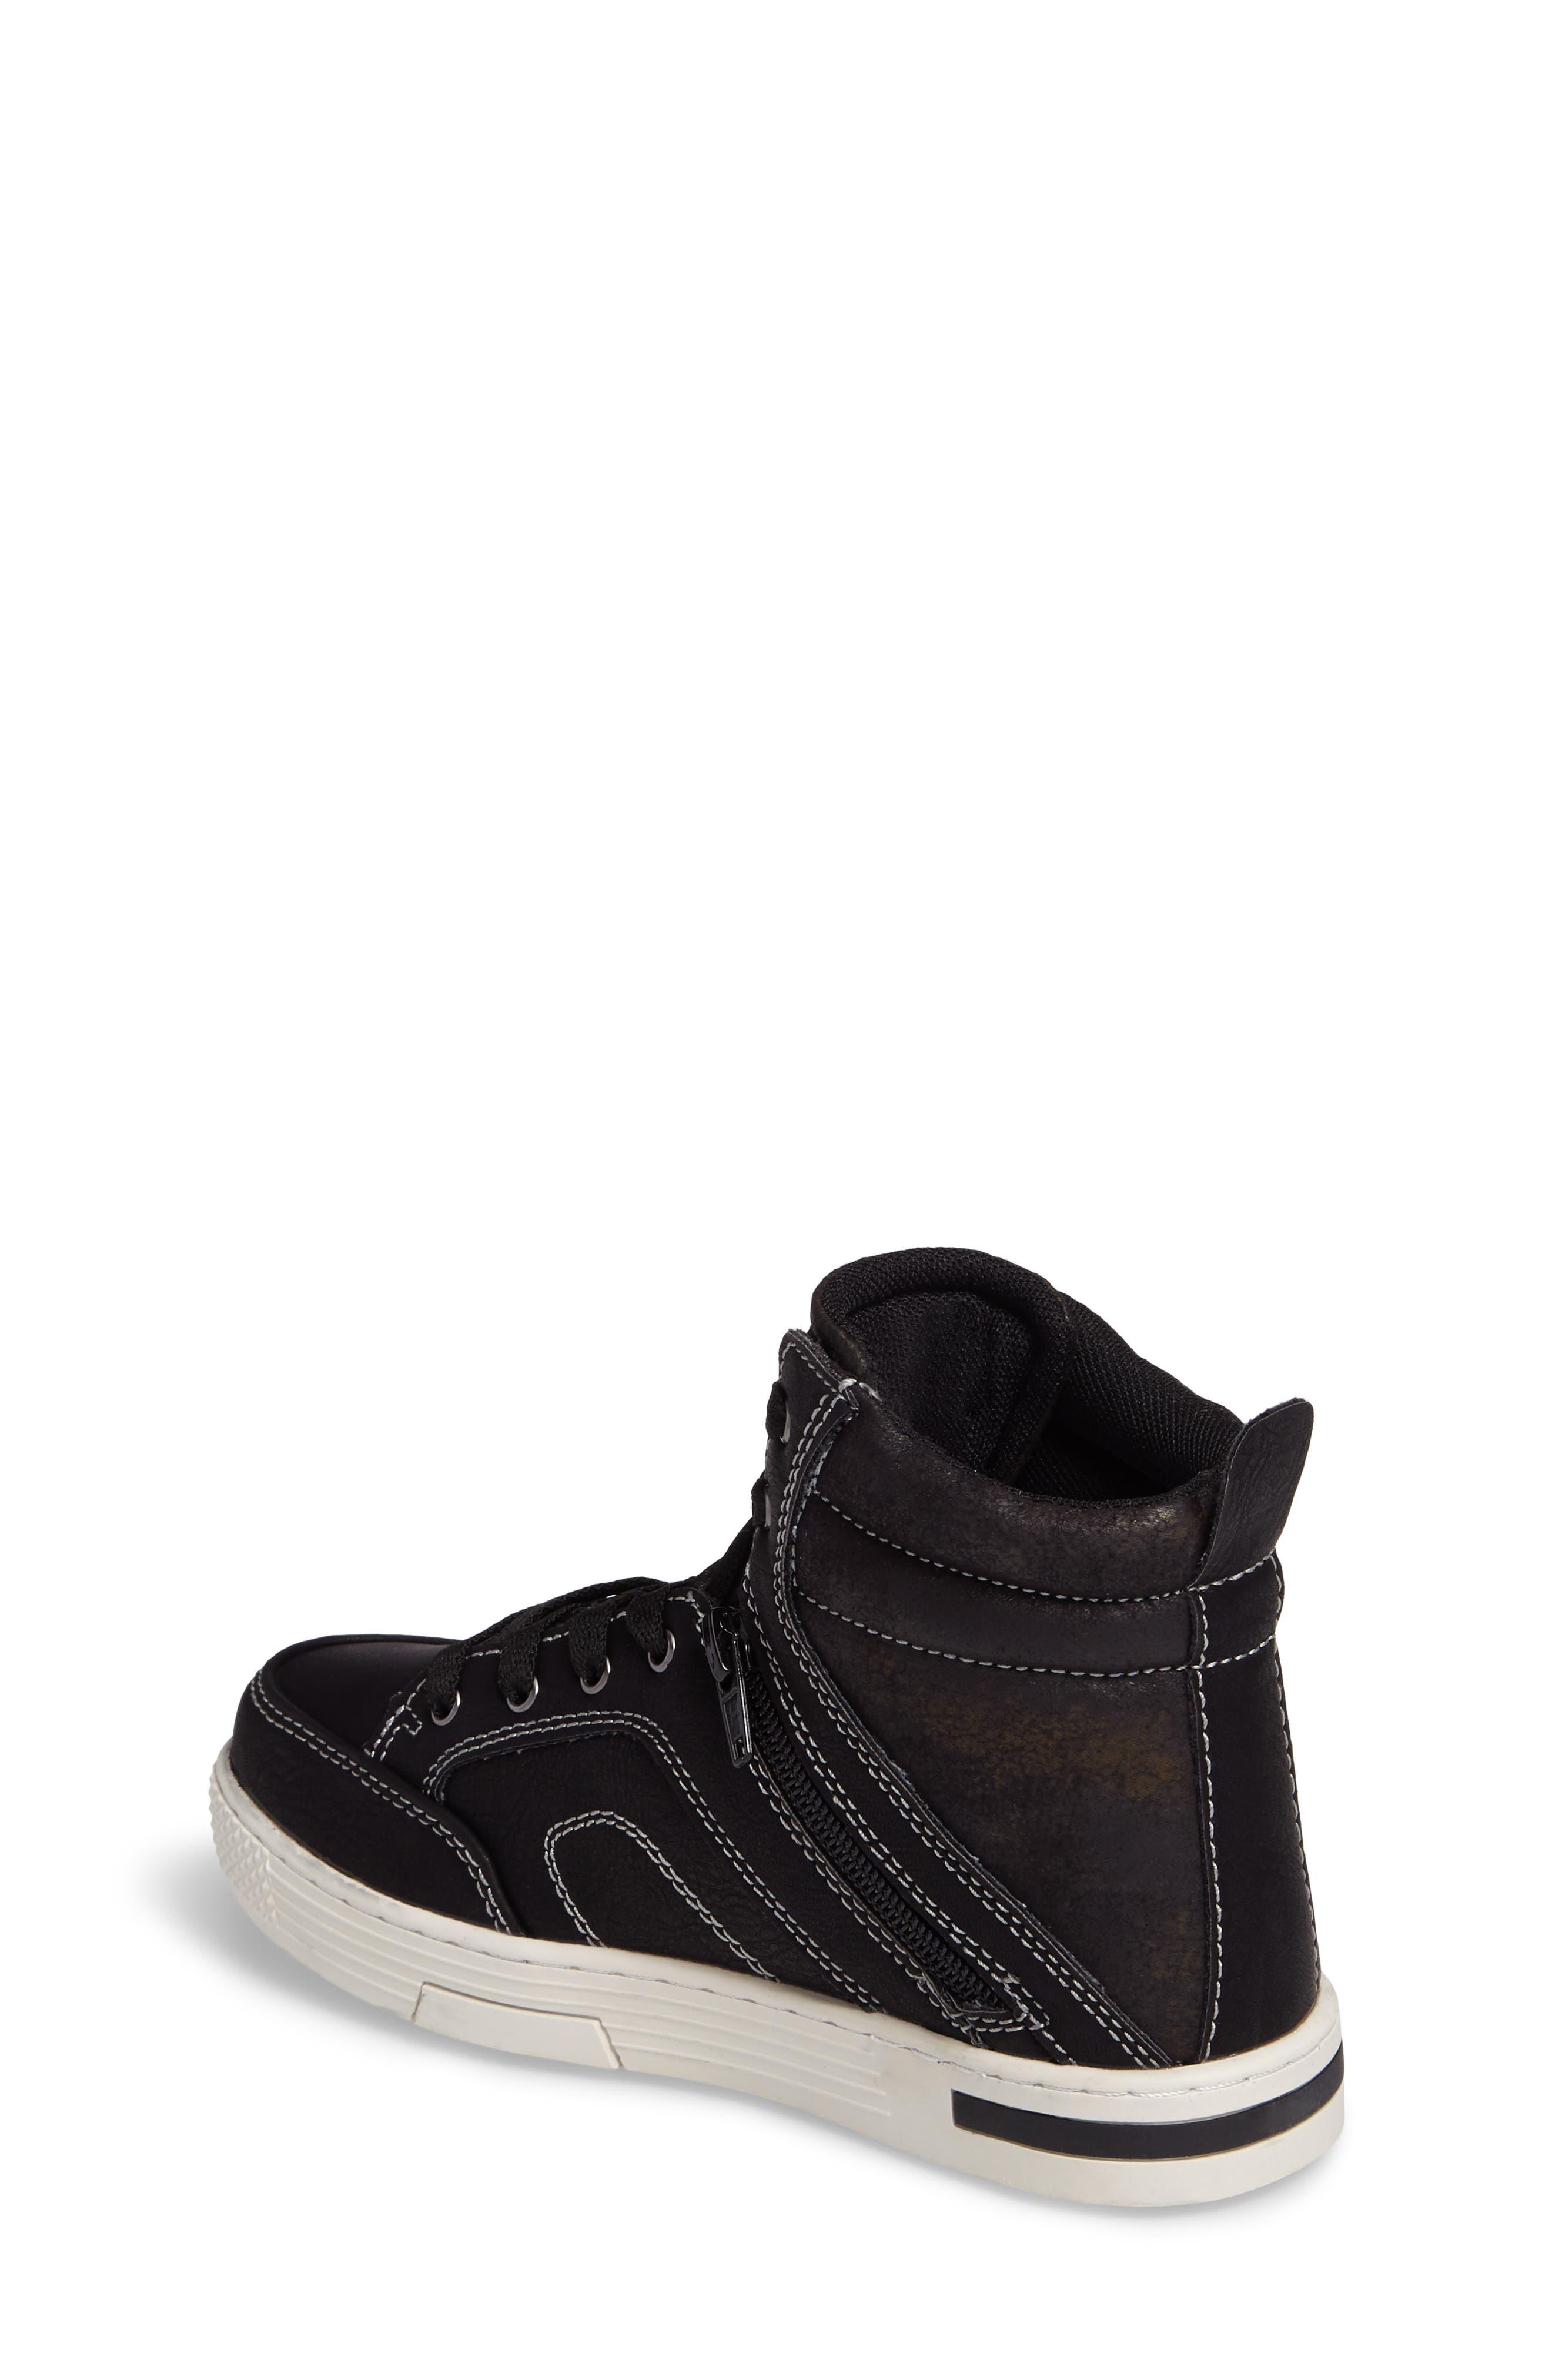 Cooler High Top Sneaker,                             Alternate thumbnail 2, color,                             Black